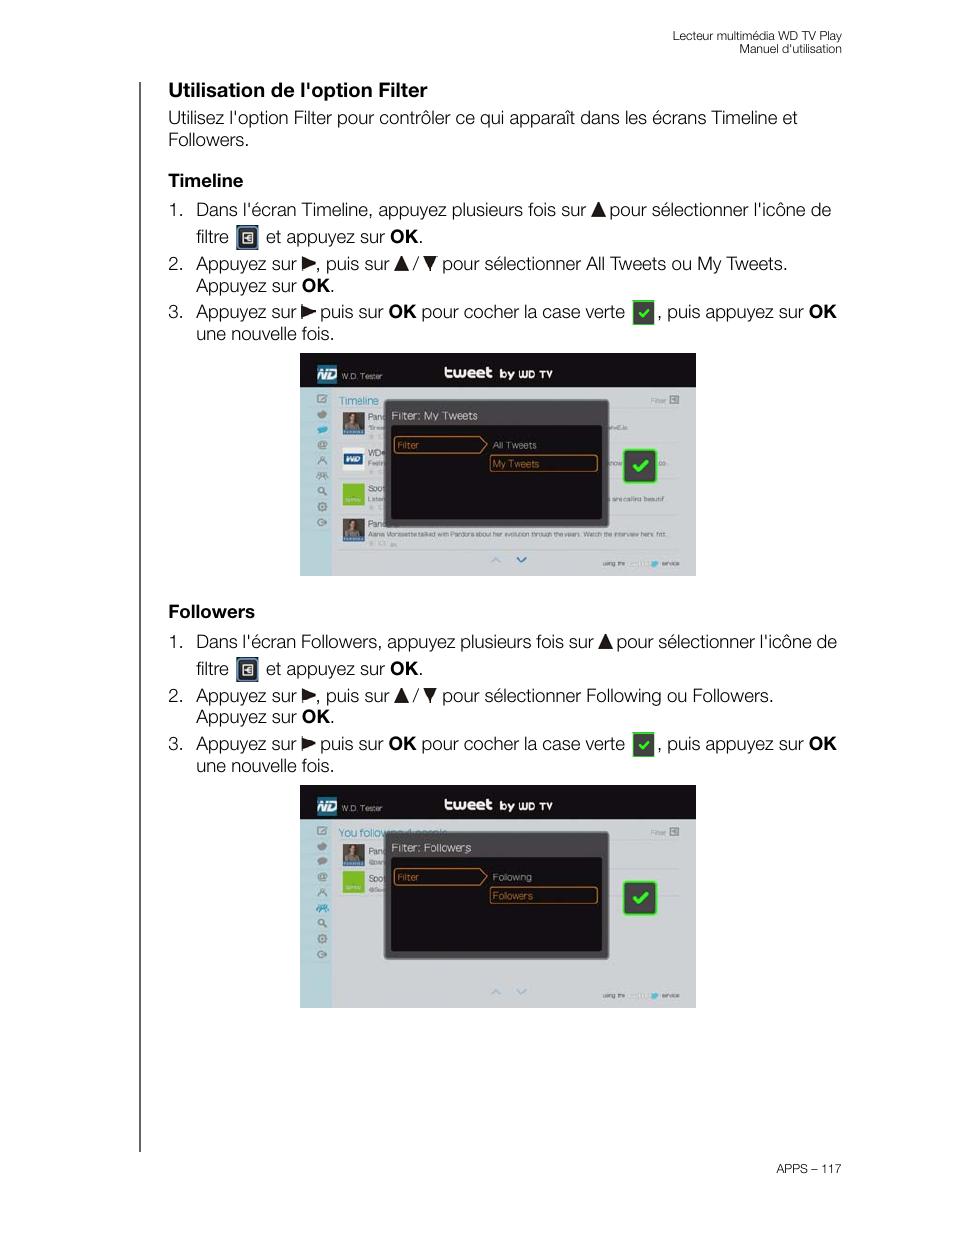 Utilisation de l'option filter, Timeline, Followers | Western